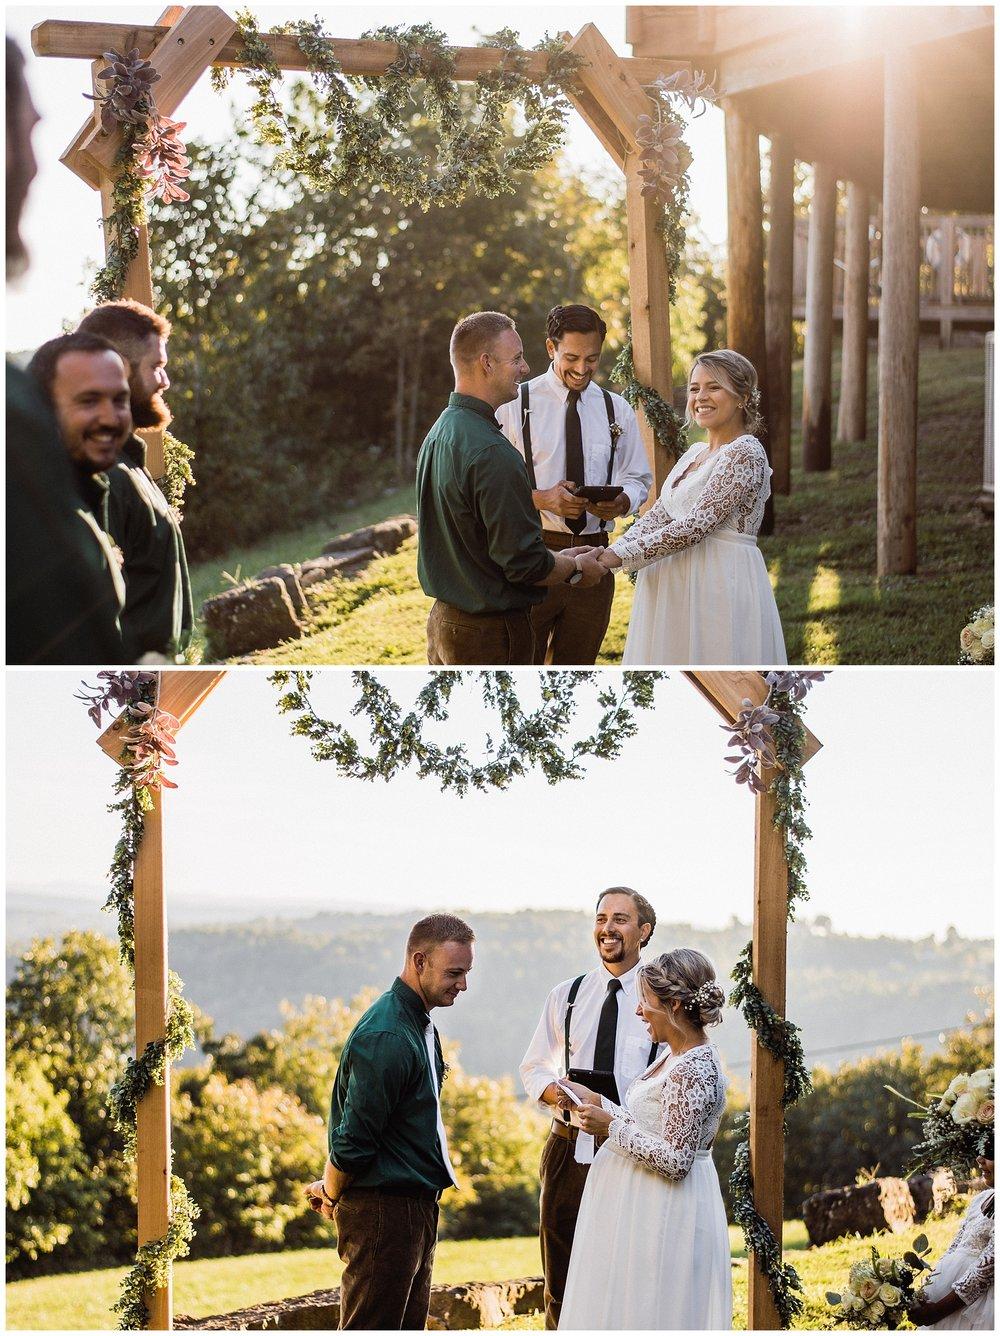 Tanner Burge Photography // Sam and Cory Mountain Riverwind Lodge Wedding - Buffalo Outdoor Center